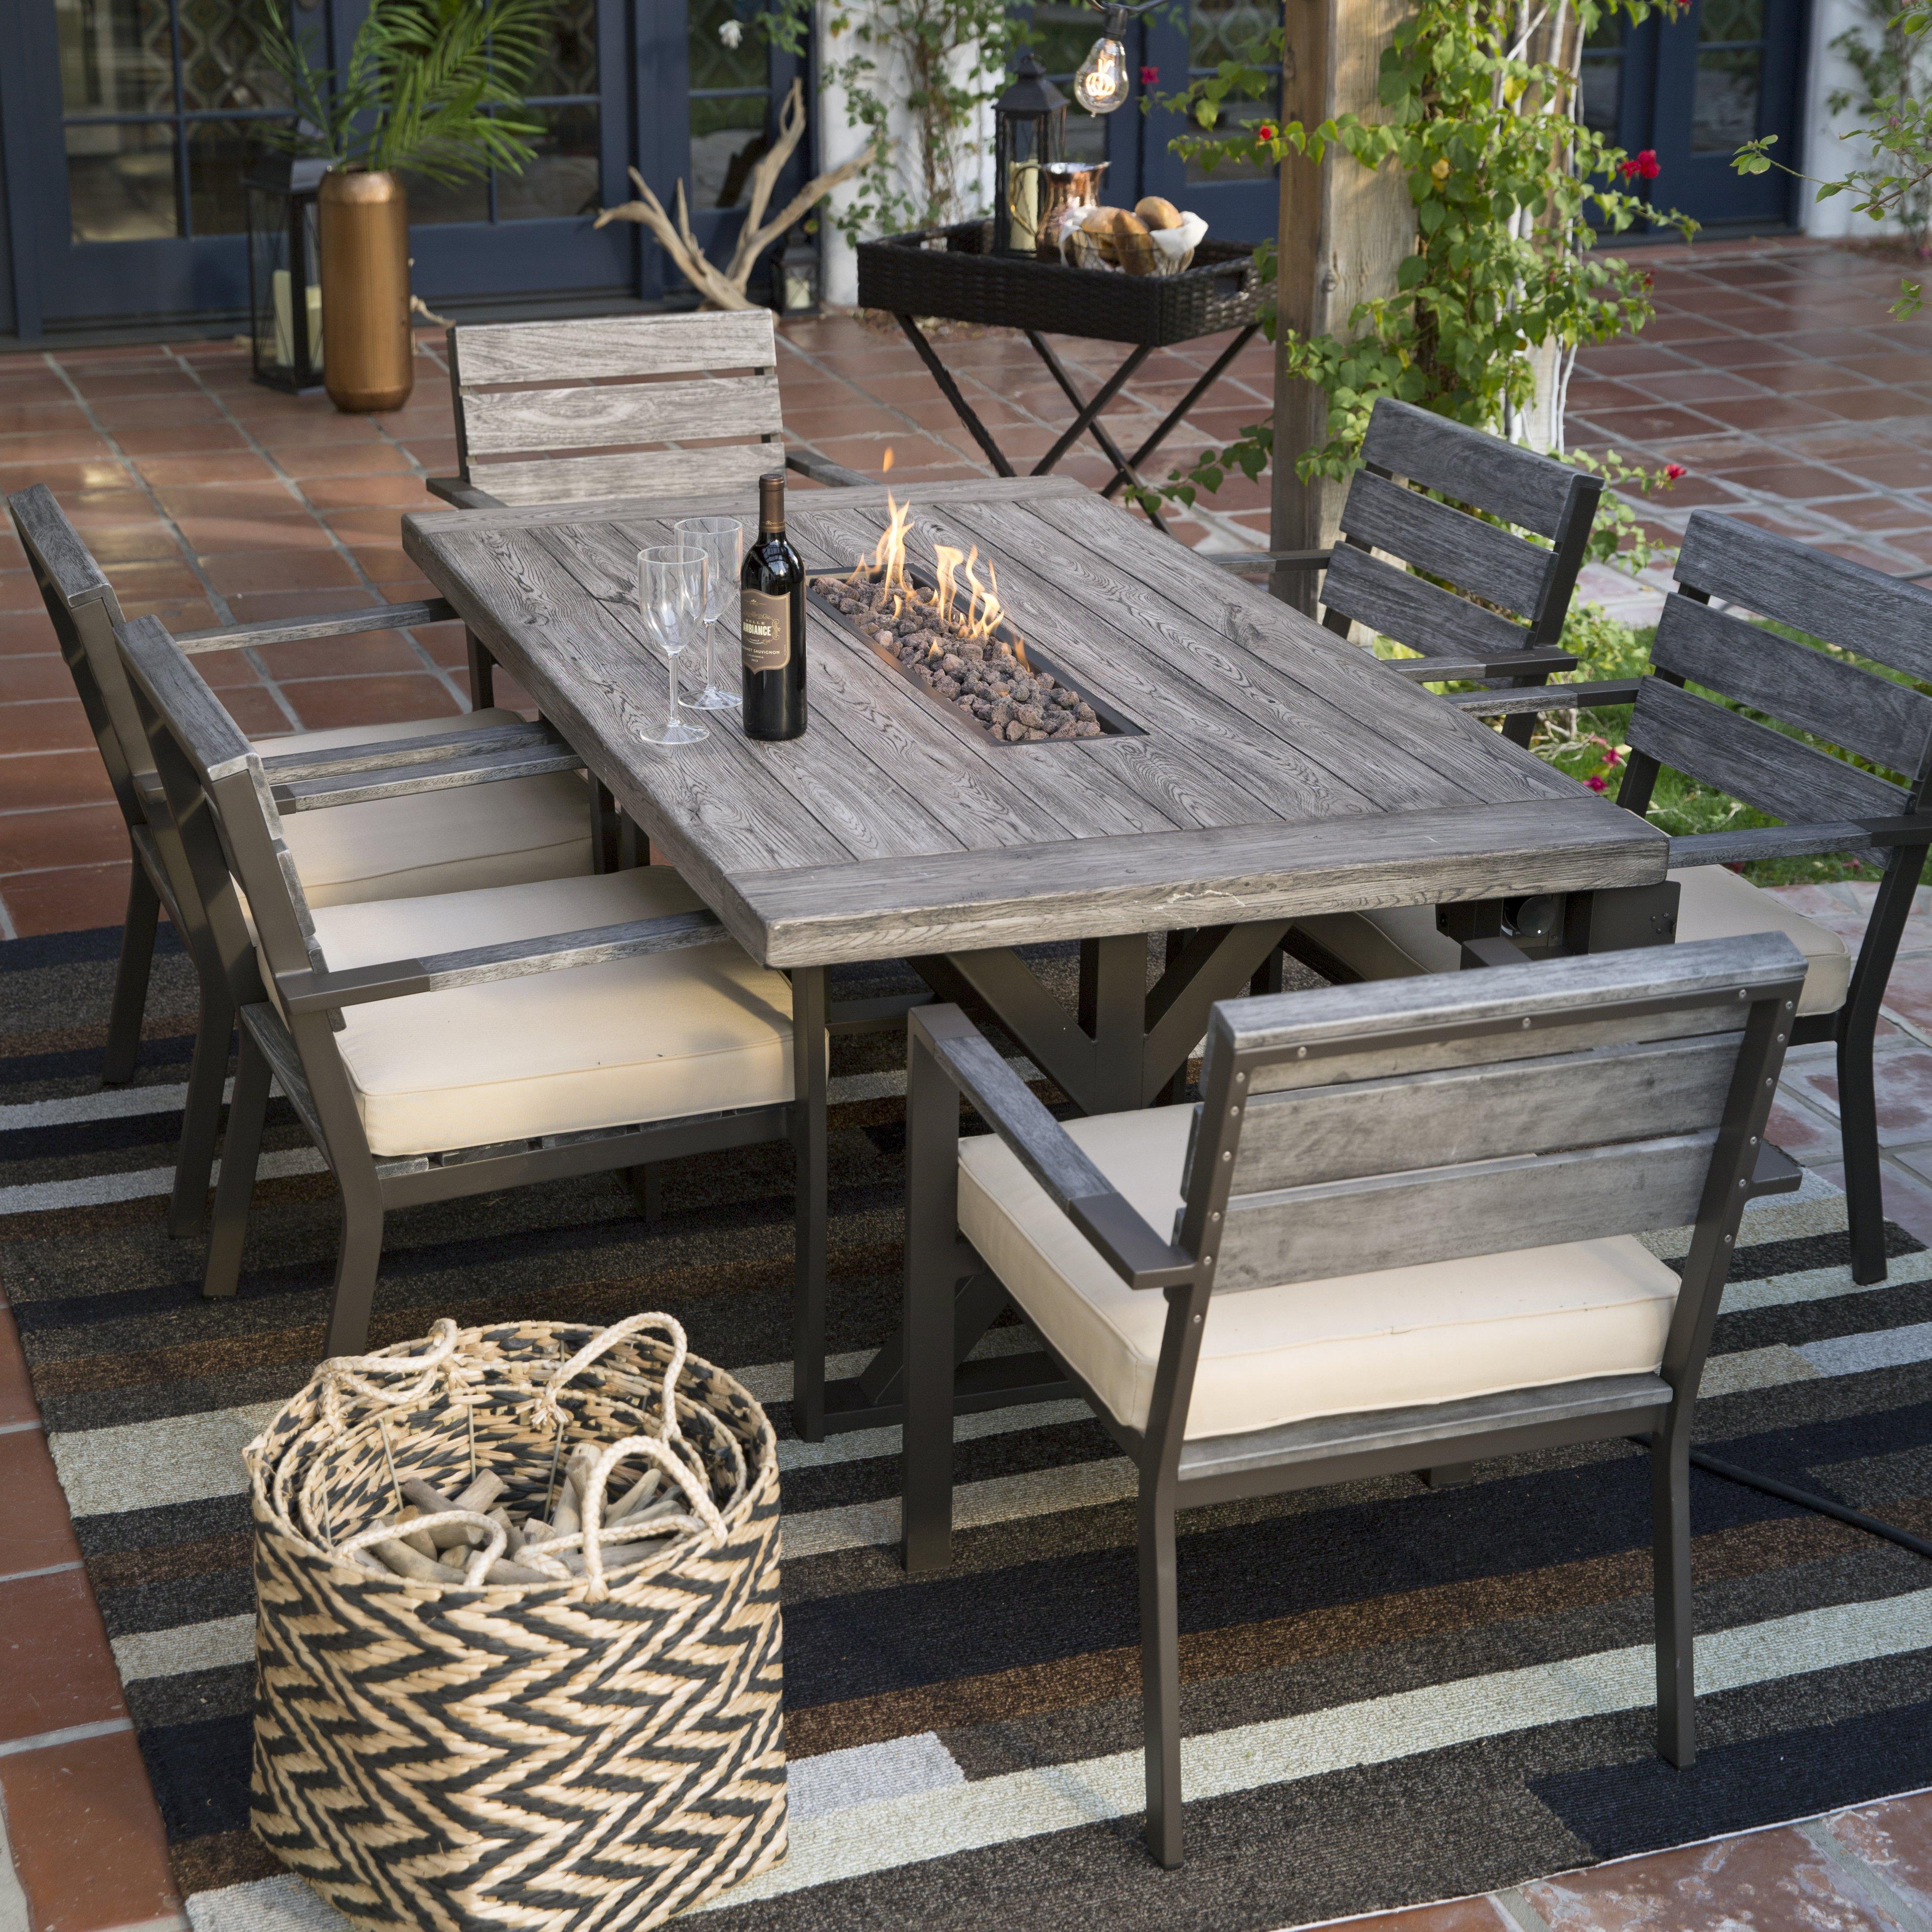 belham living silba 7 piece envirostone fire pit patio dining set KVFYMZE